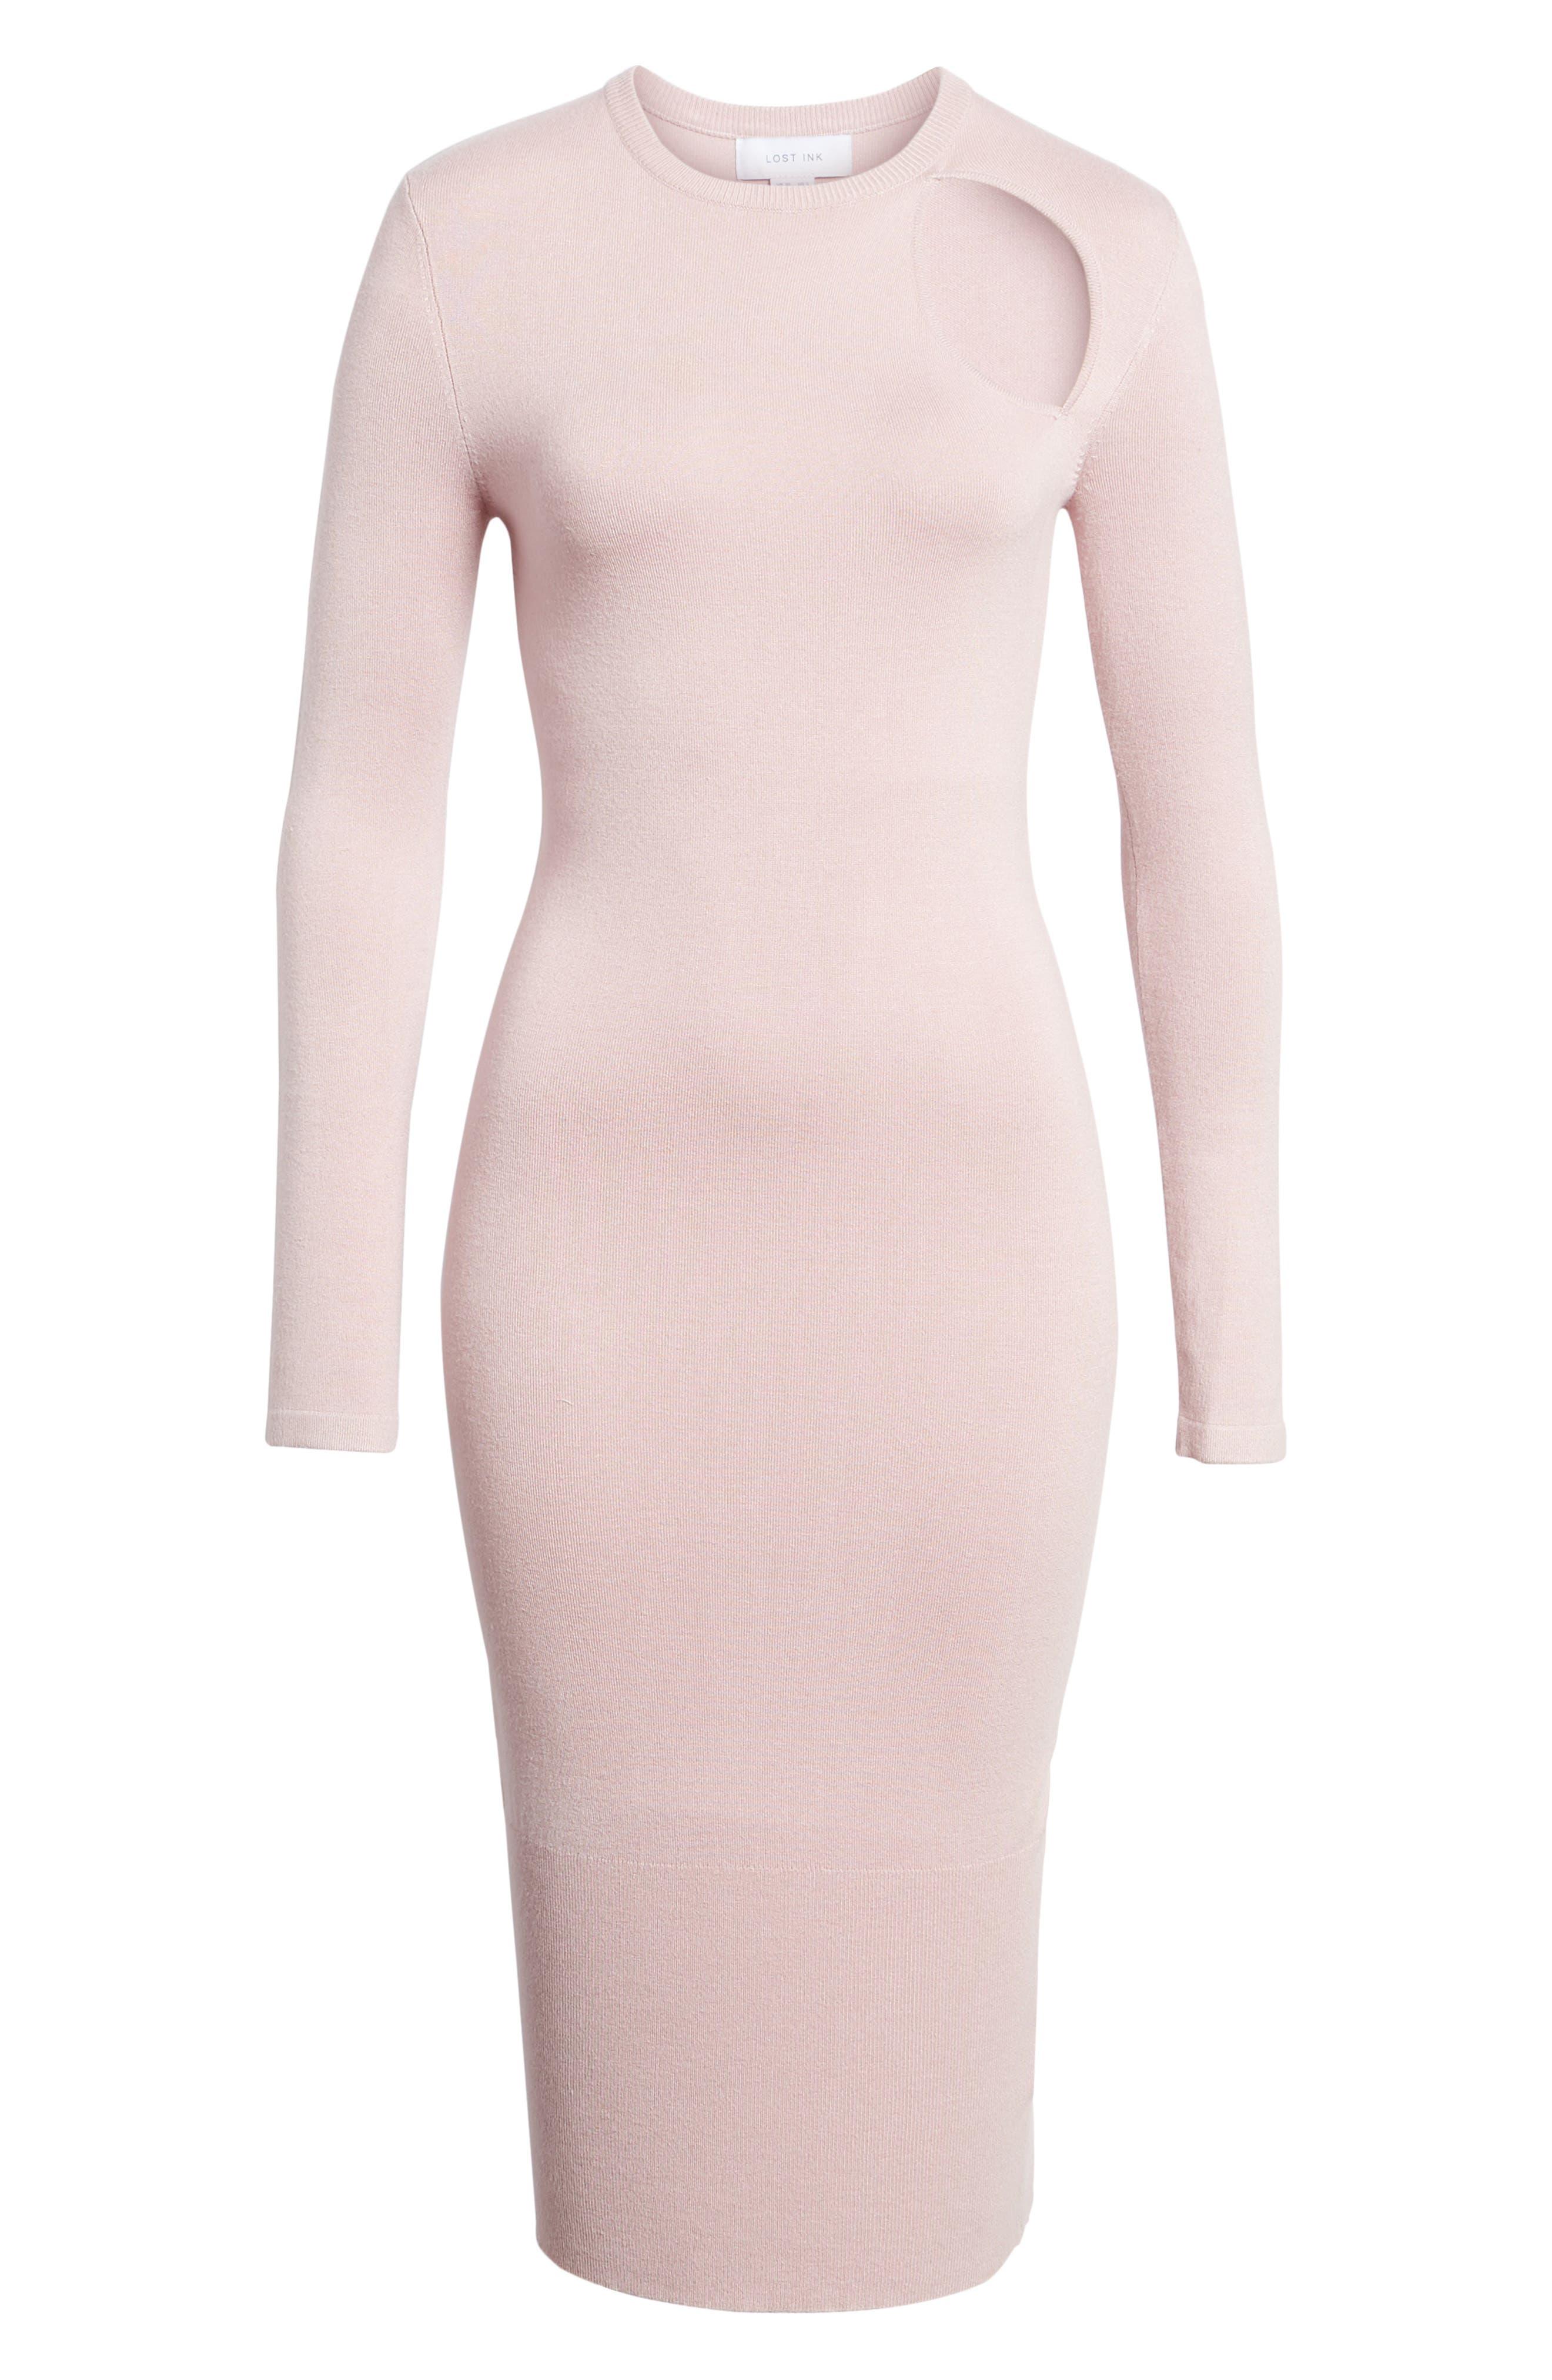 Body-Con Midi Dress,                             Alternate thumbnail 6, color,                             650